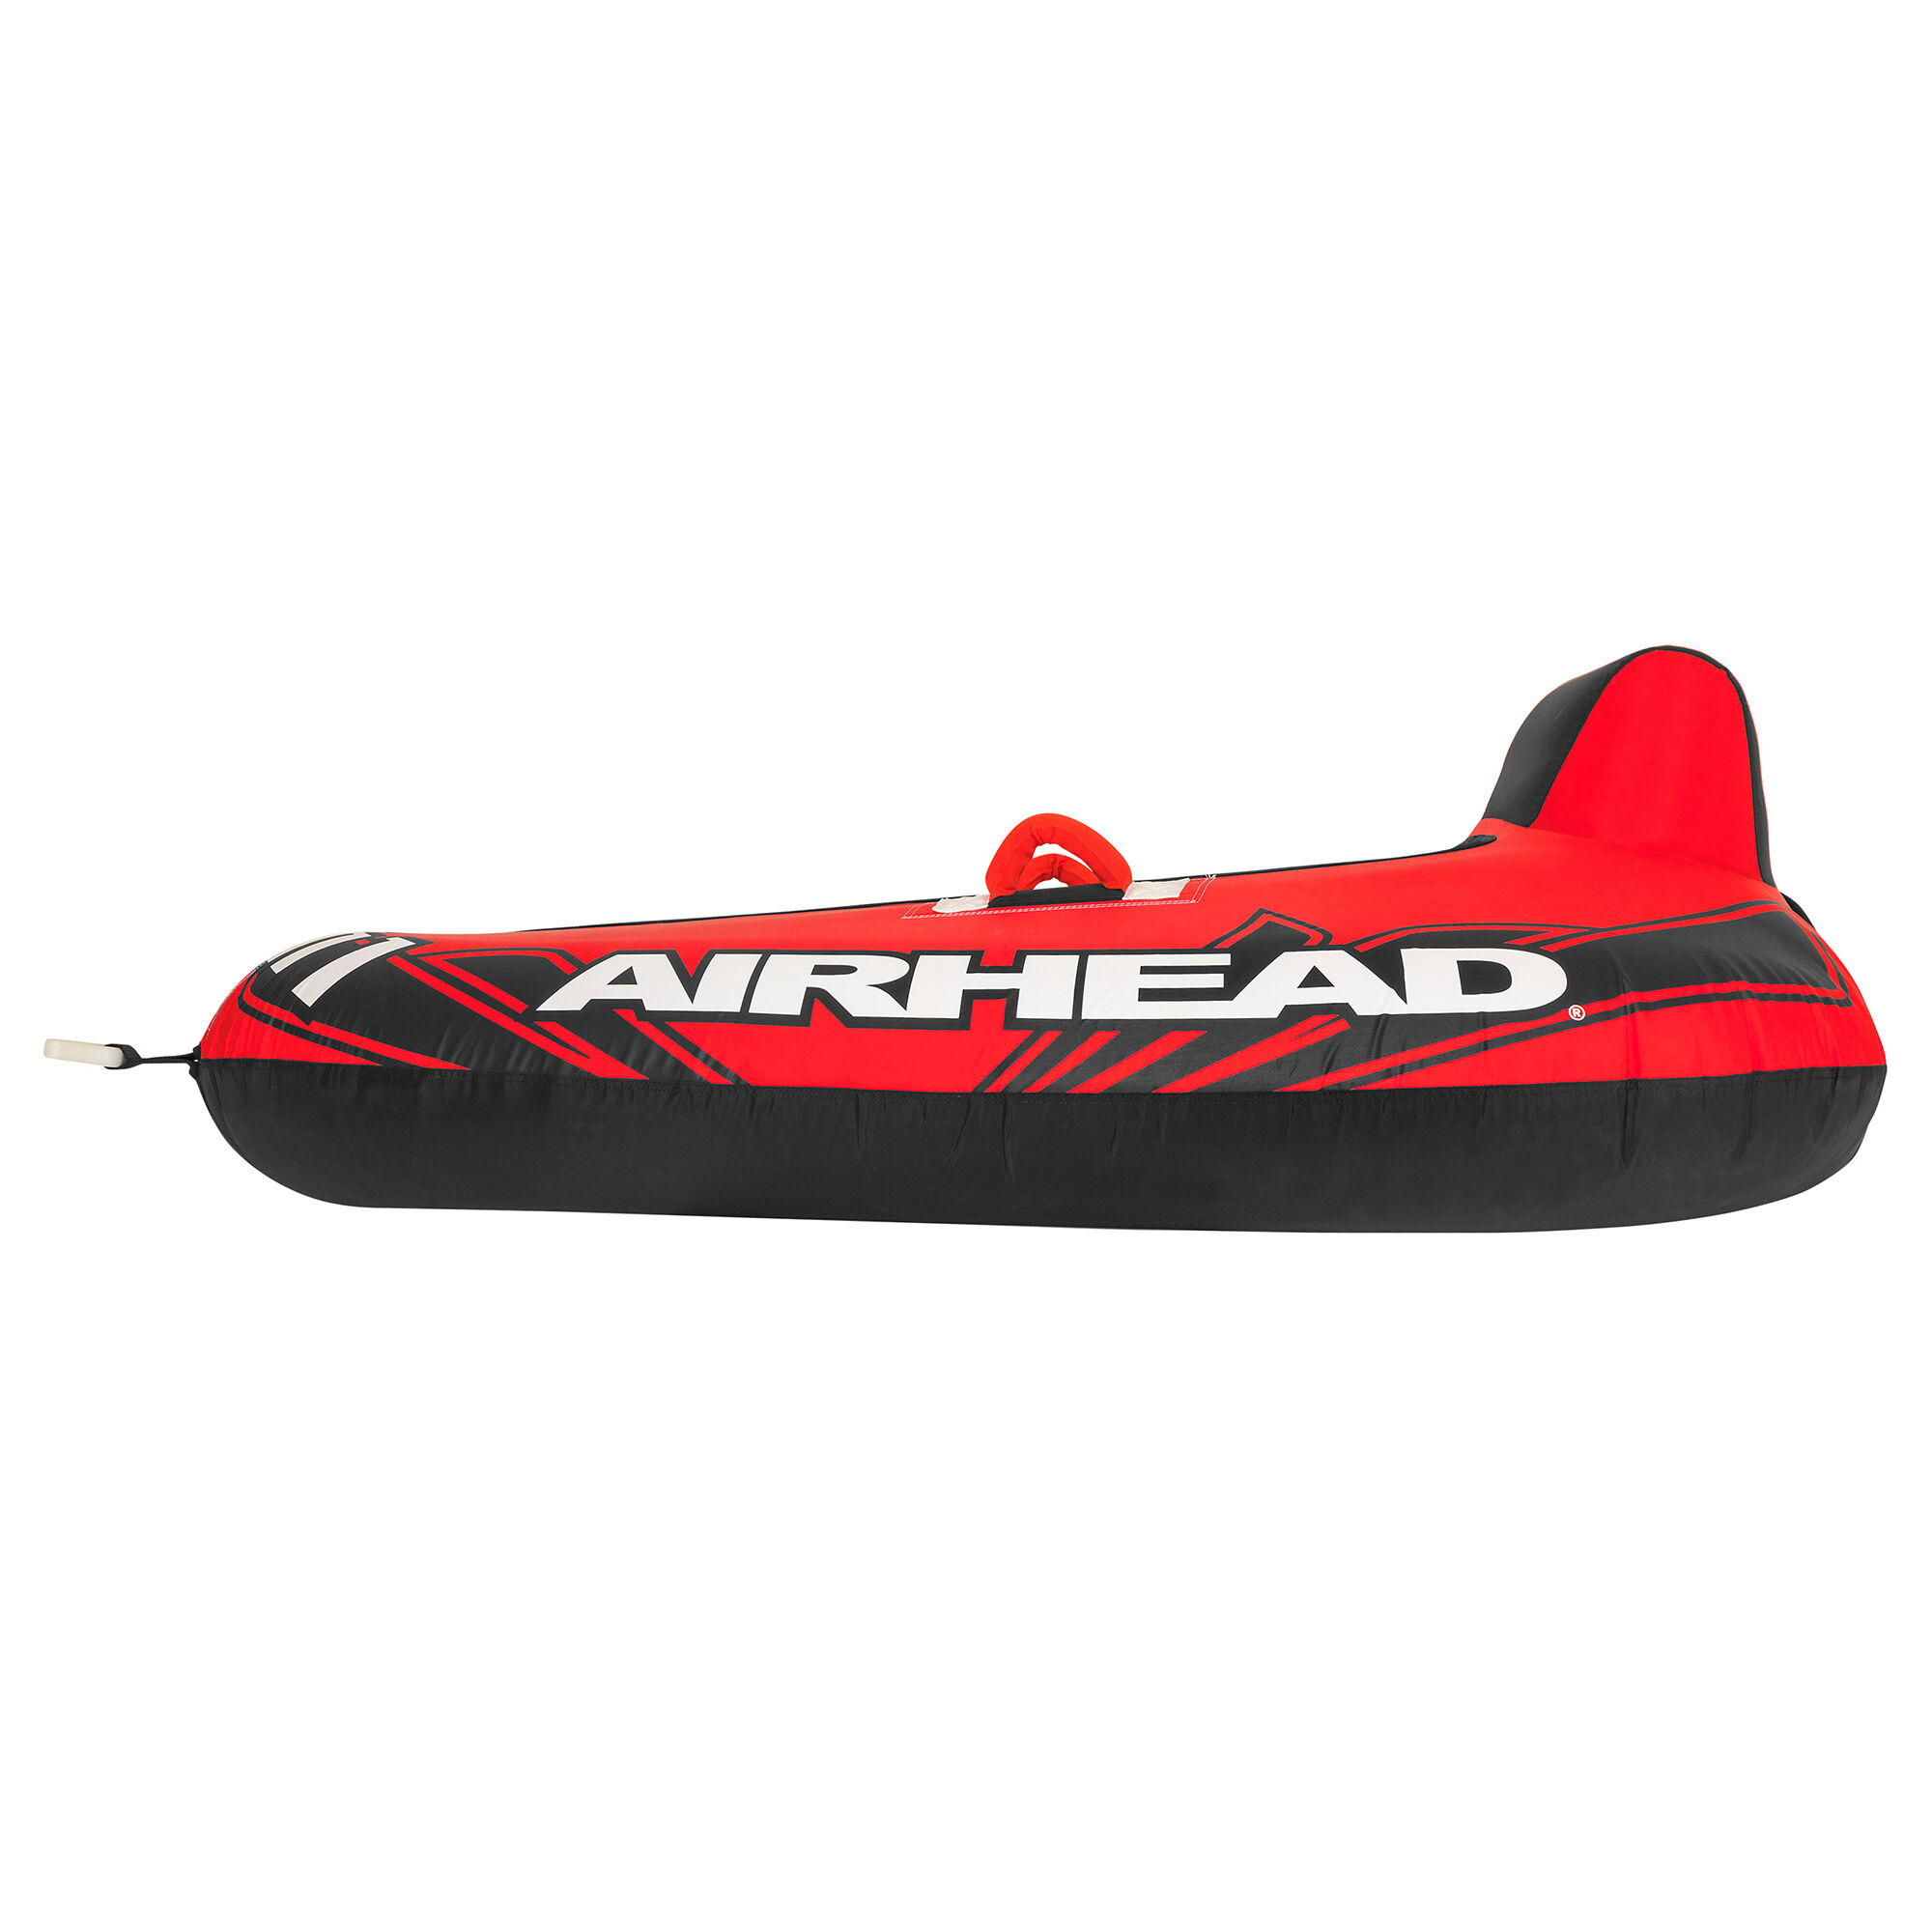 Airhead Mach 1 1-person Towable Tube Overton'